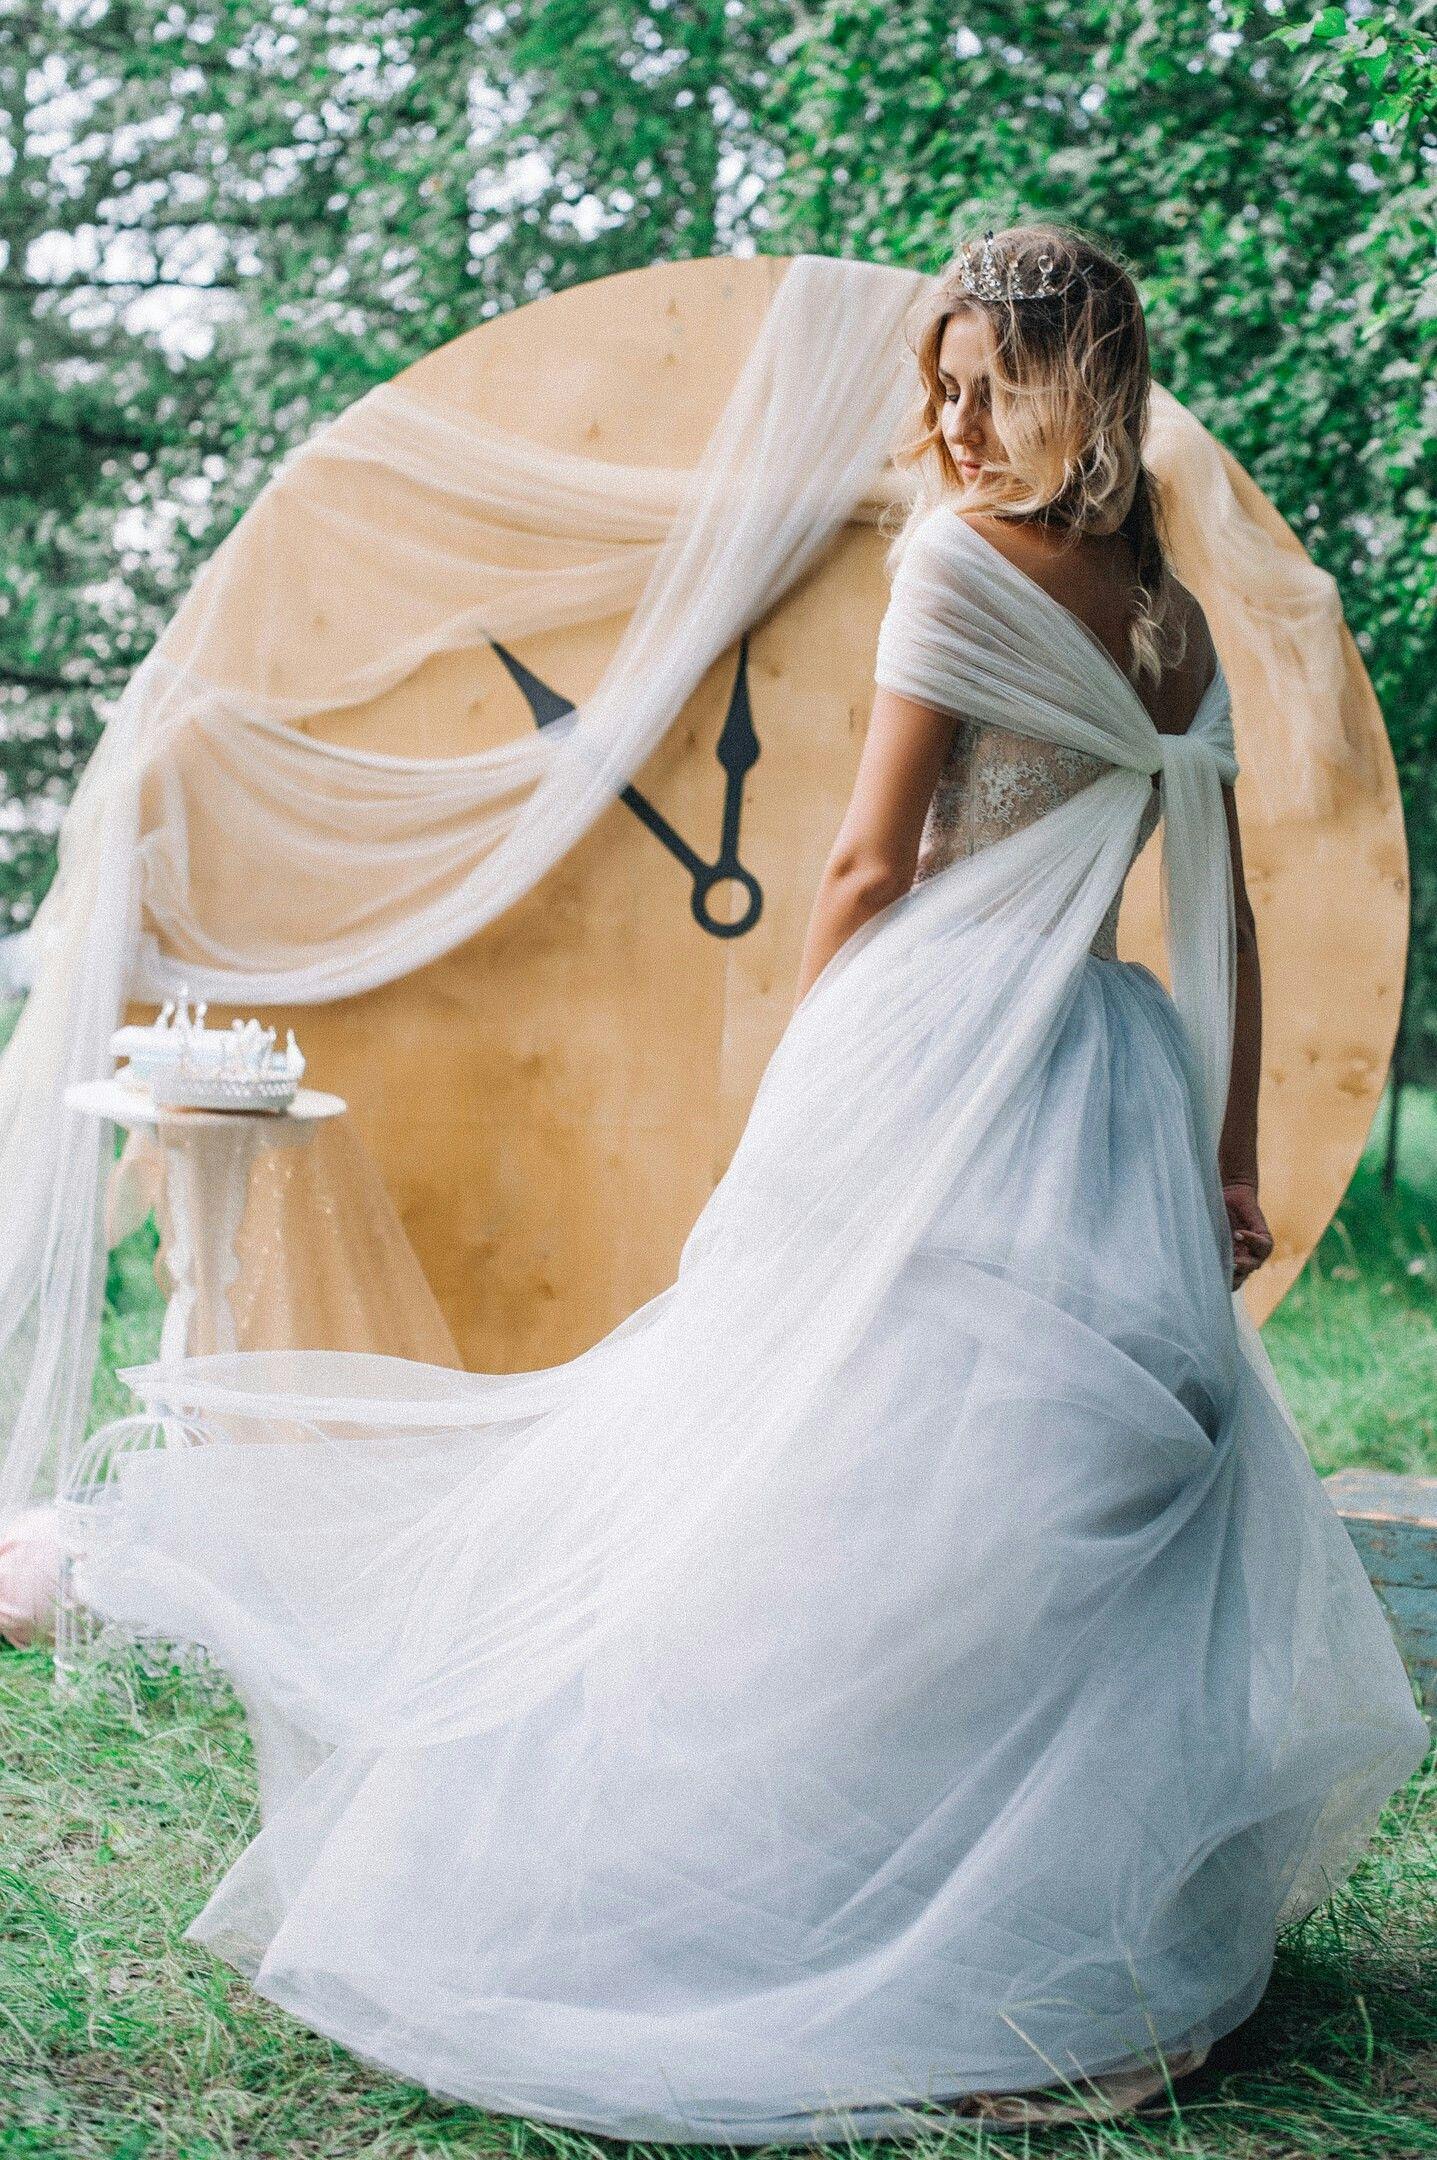 Cinderella #cinderella #fineart #wedding #princess #fairytale #photography